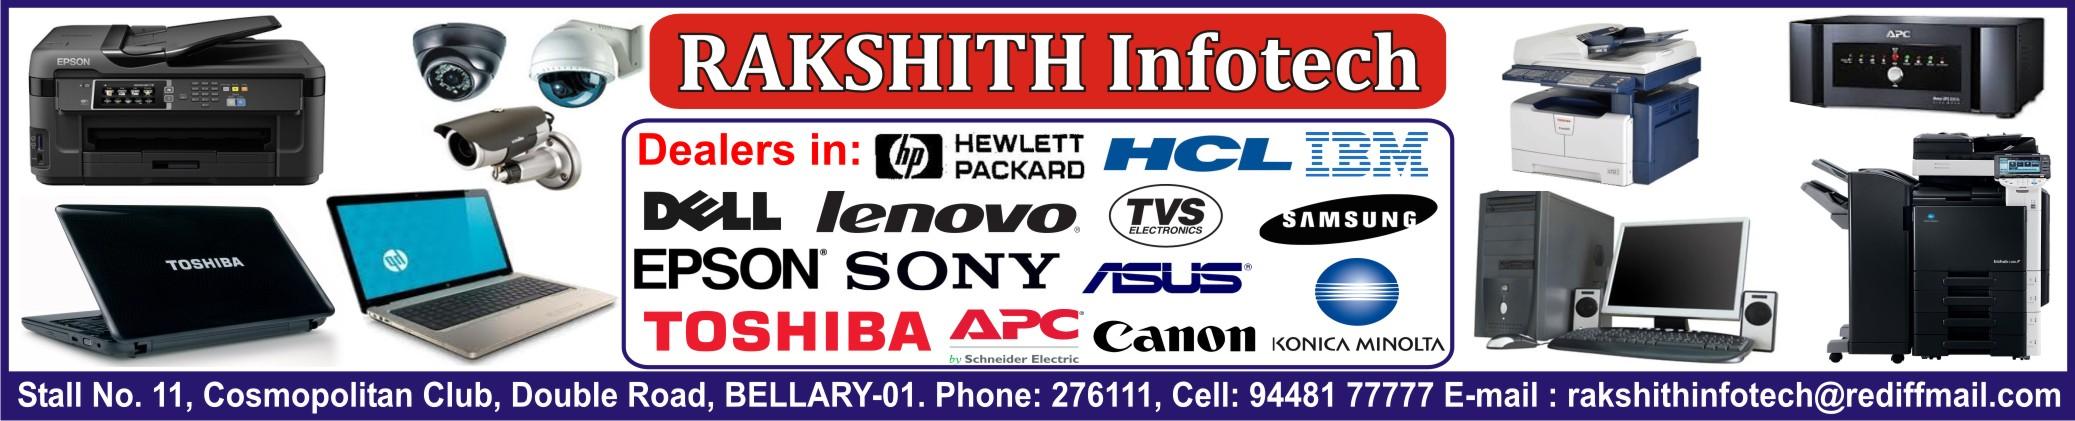 RAKSHITH Infotech